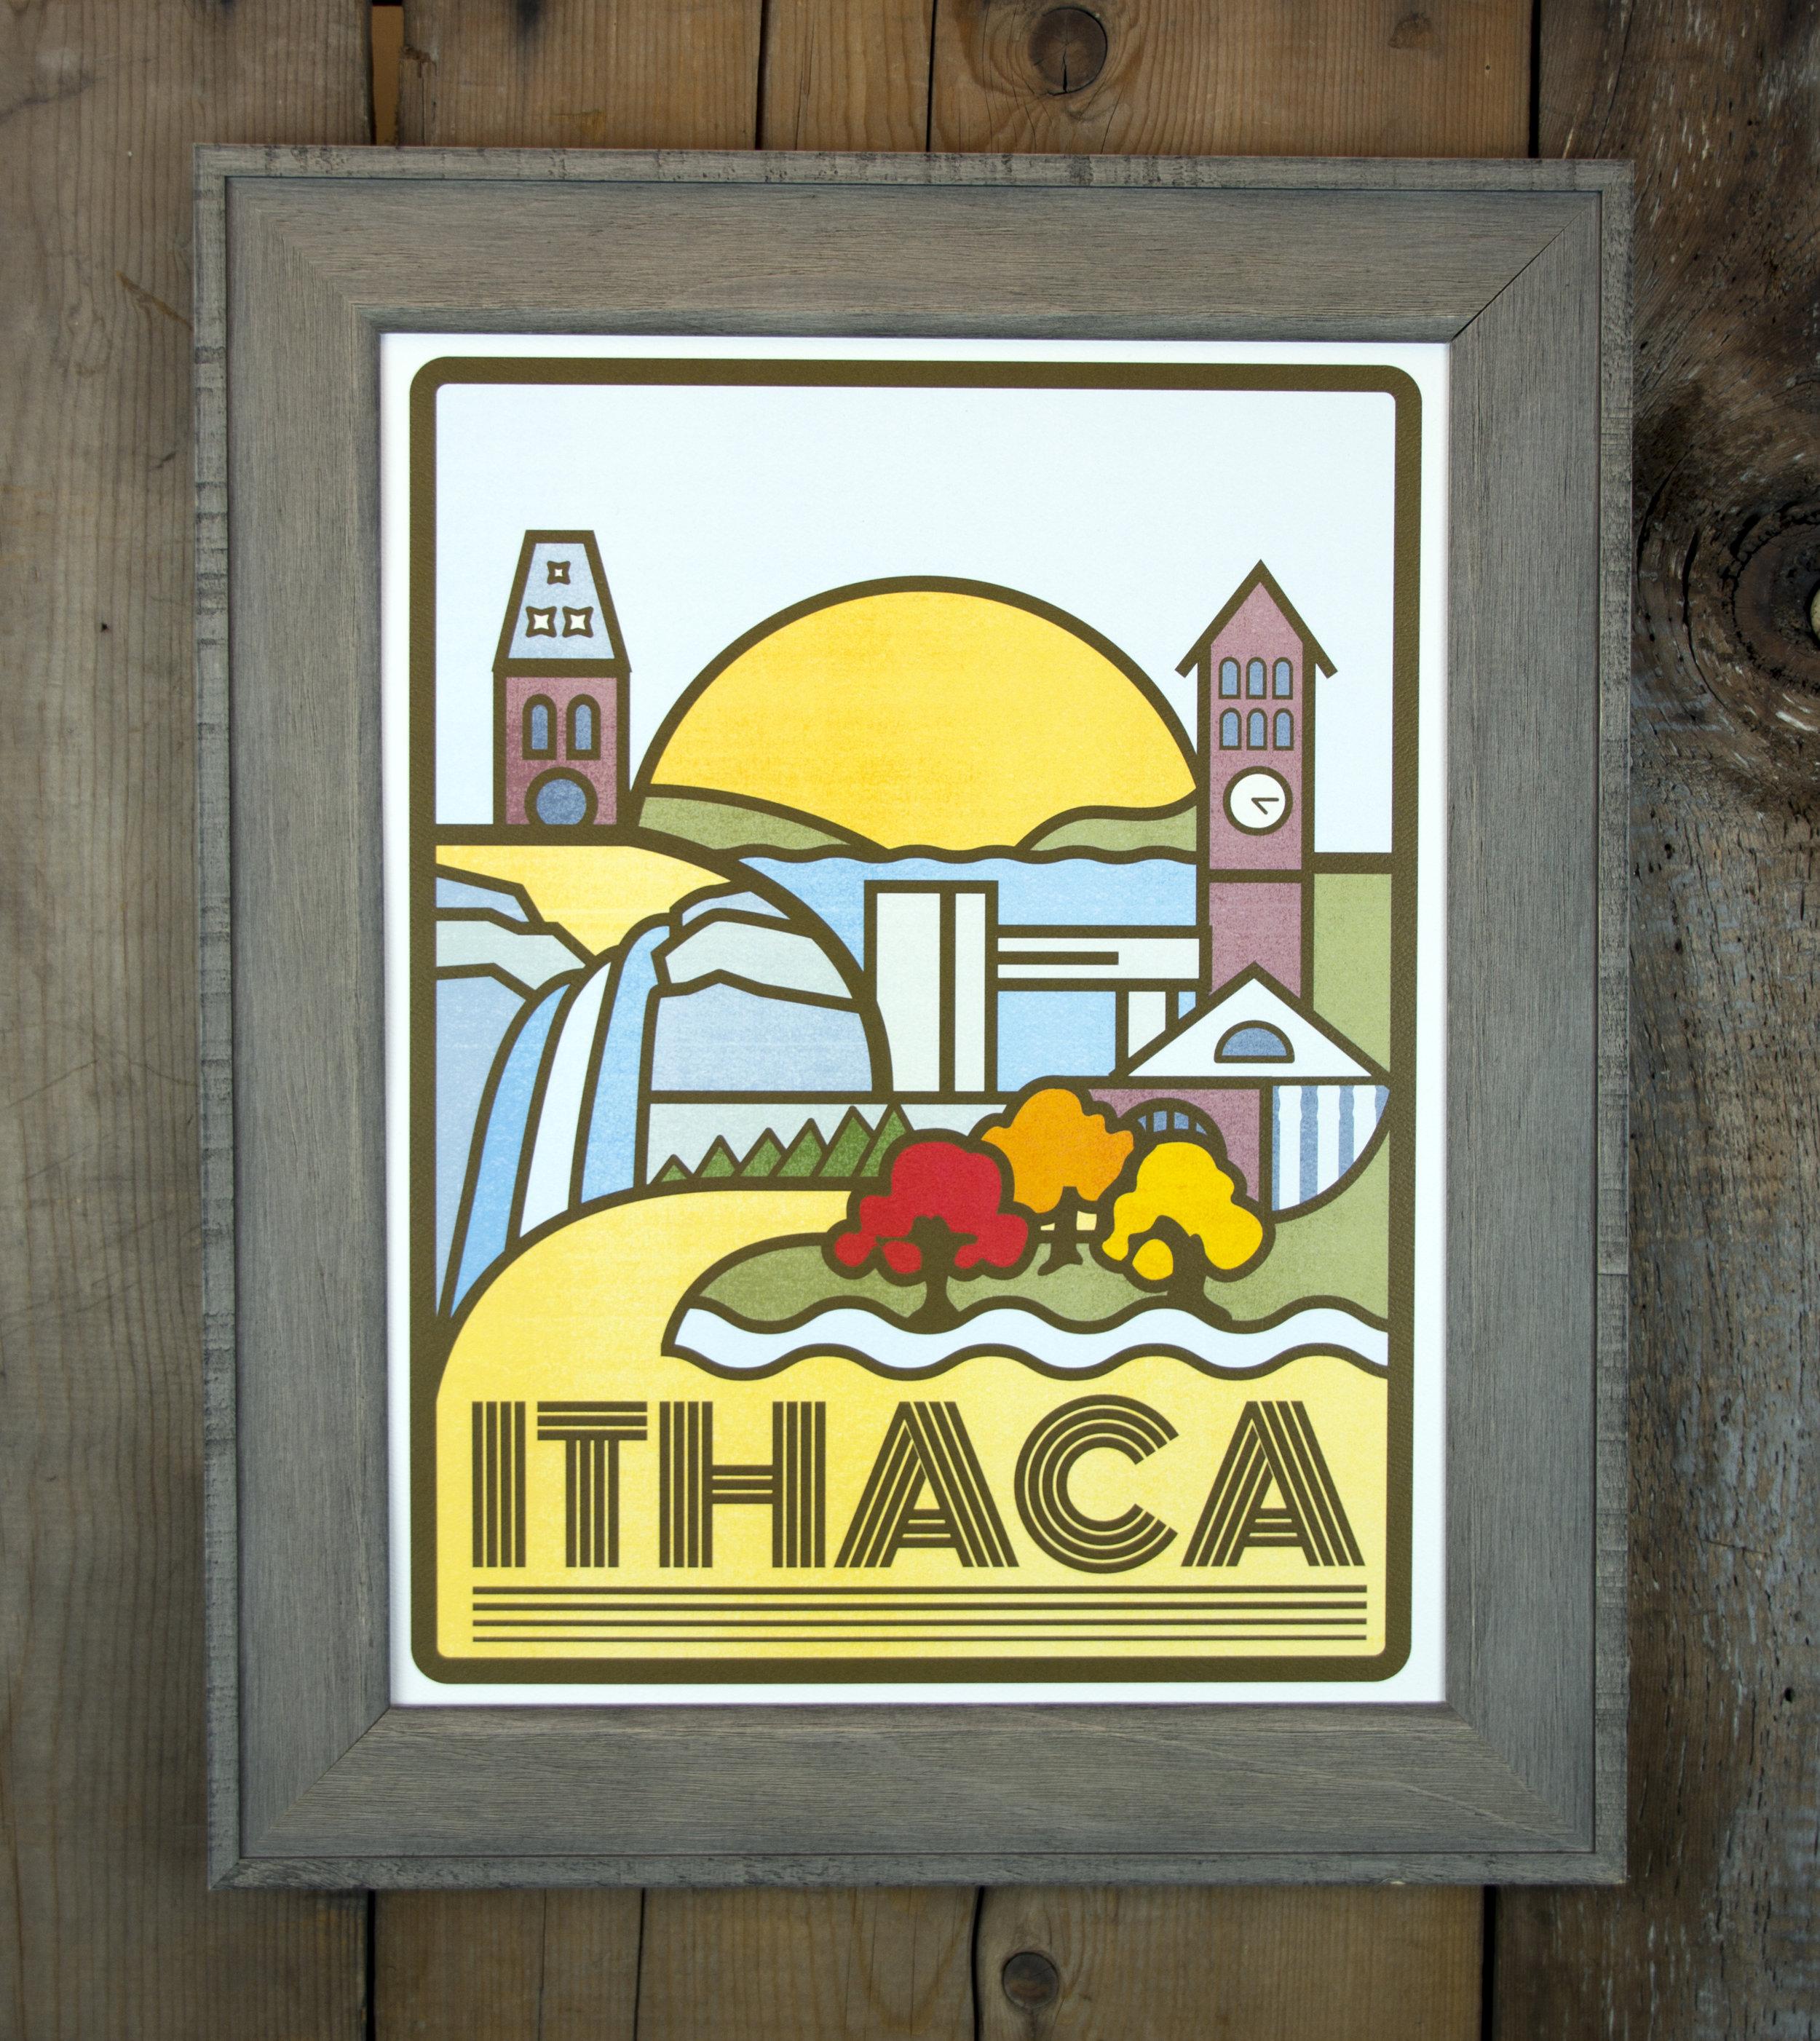 spw ithaca.jpg